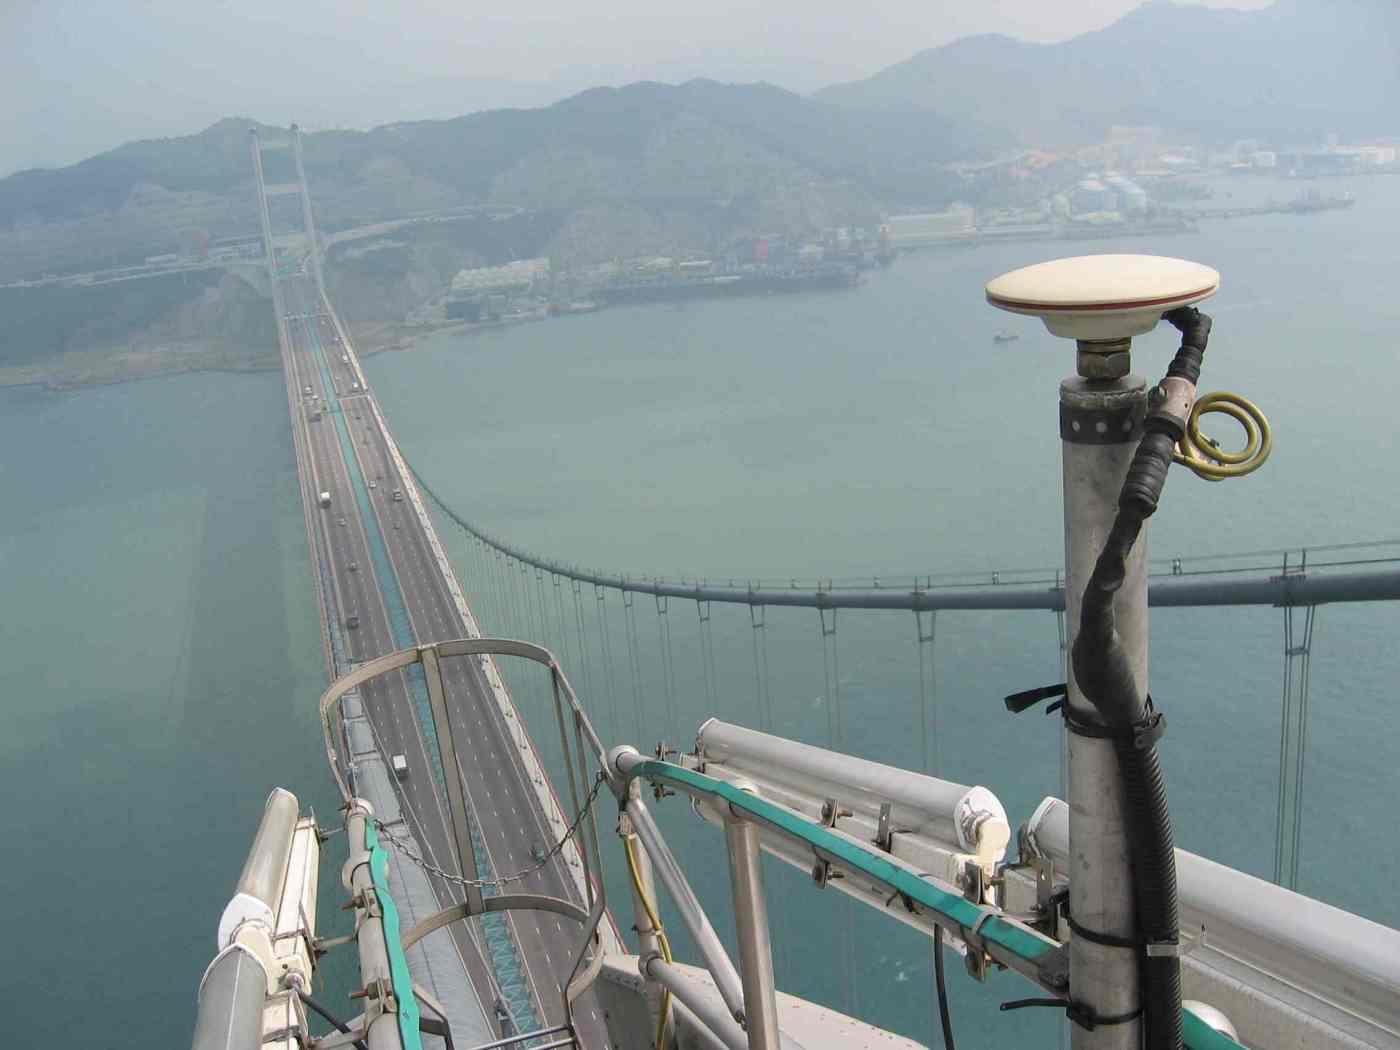 TSING MA BRIDGE GNSS MONITORING